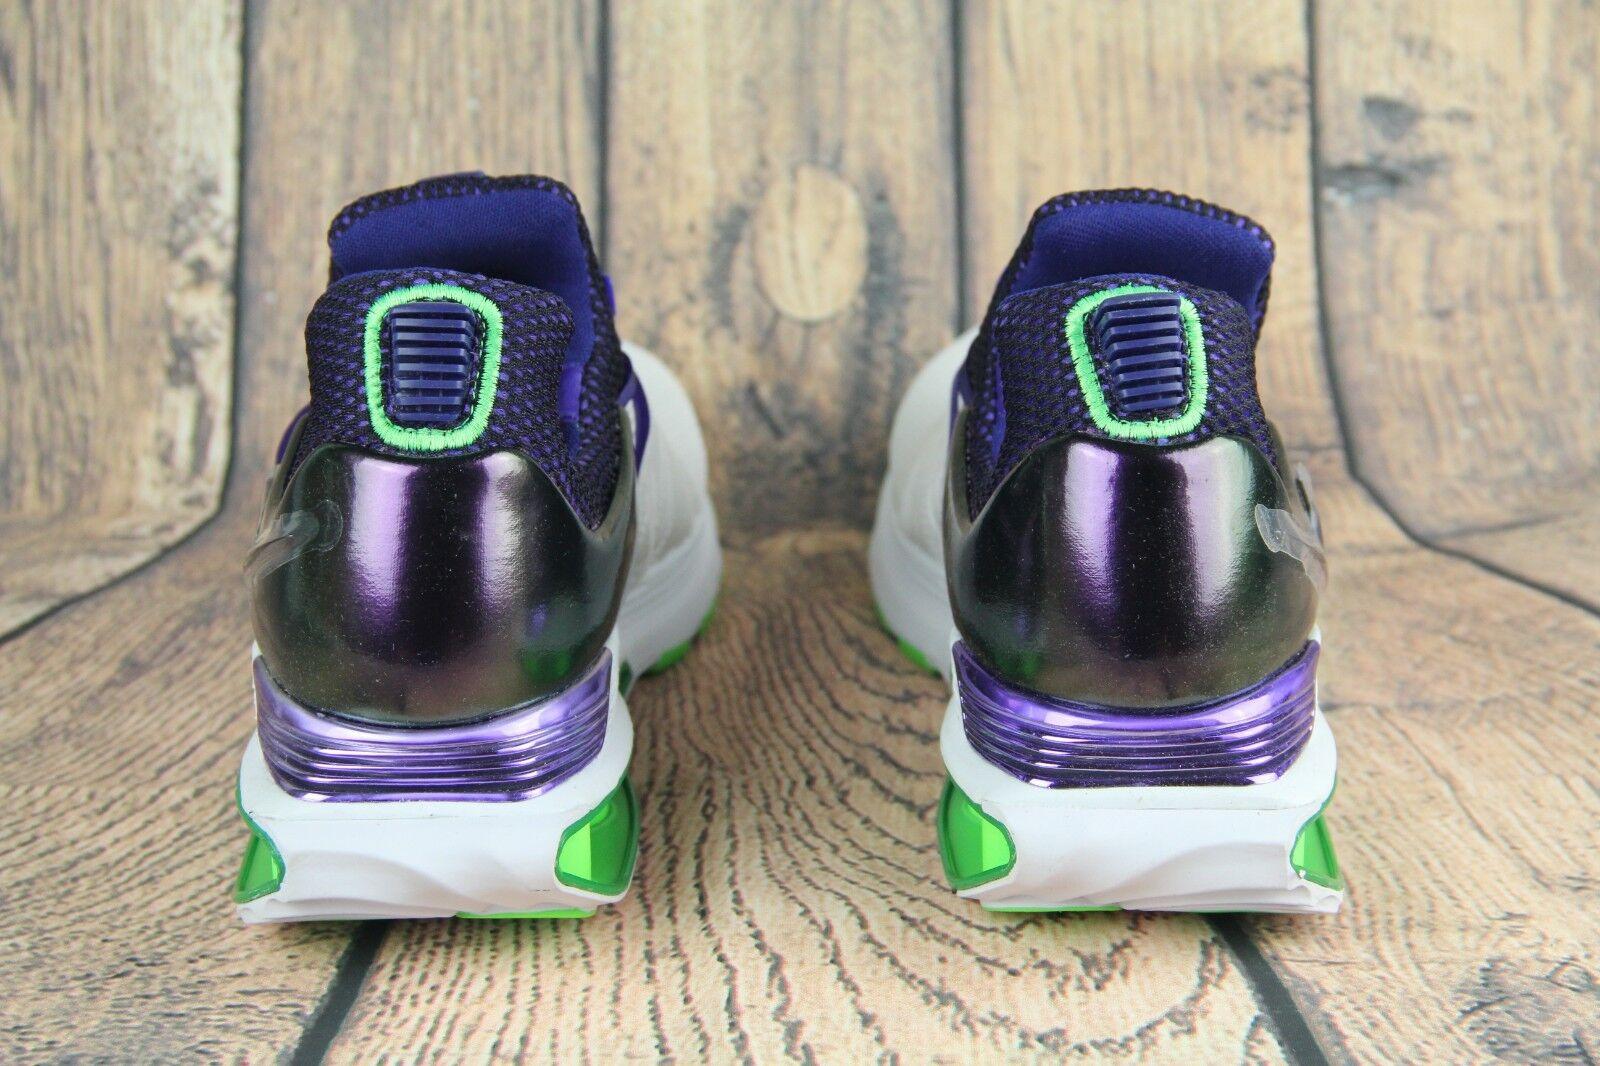 Nike shox schwere turnschuhe, weiße fusion violet violet violet wut grüne aq8554-105 frauen sz 2669b1